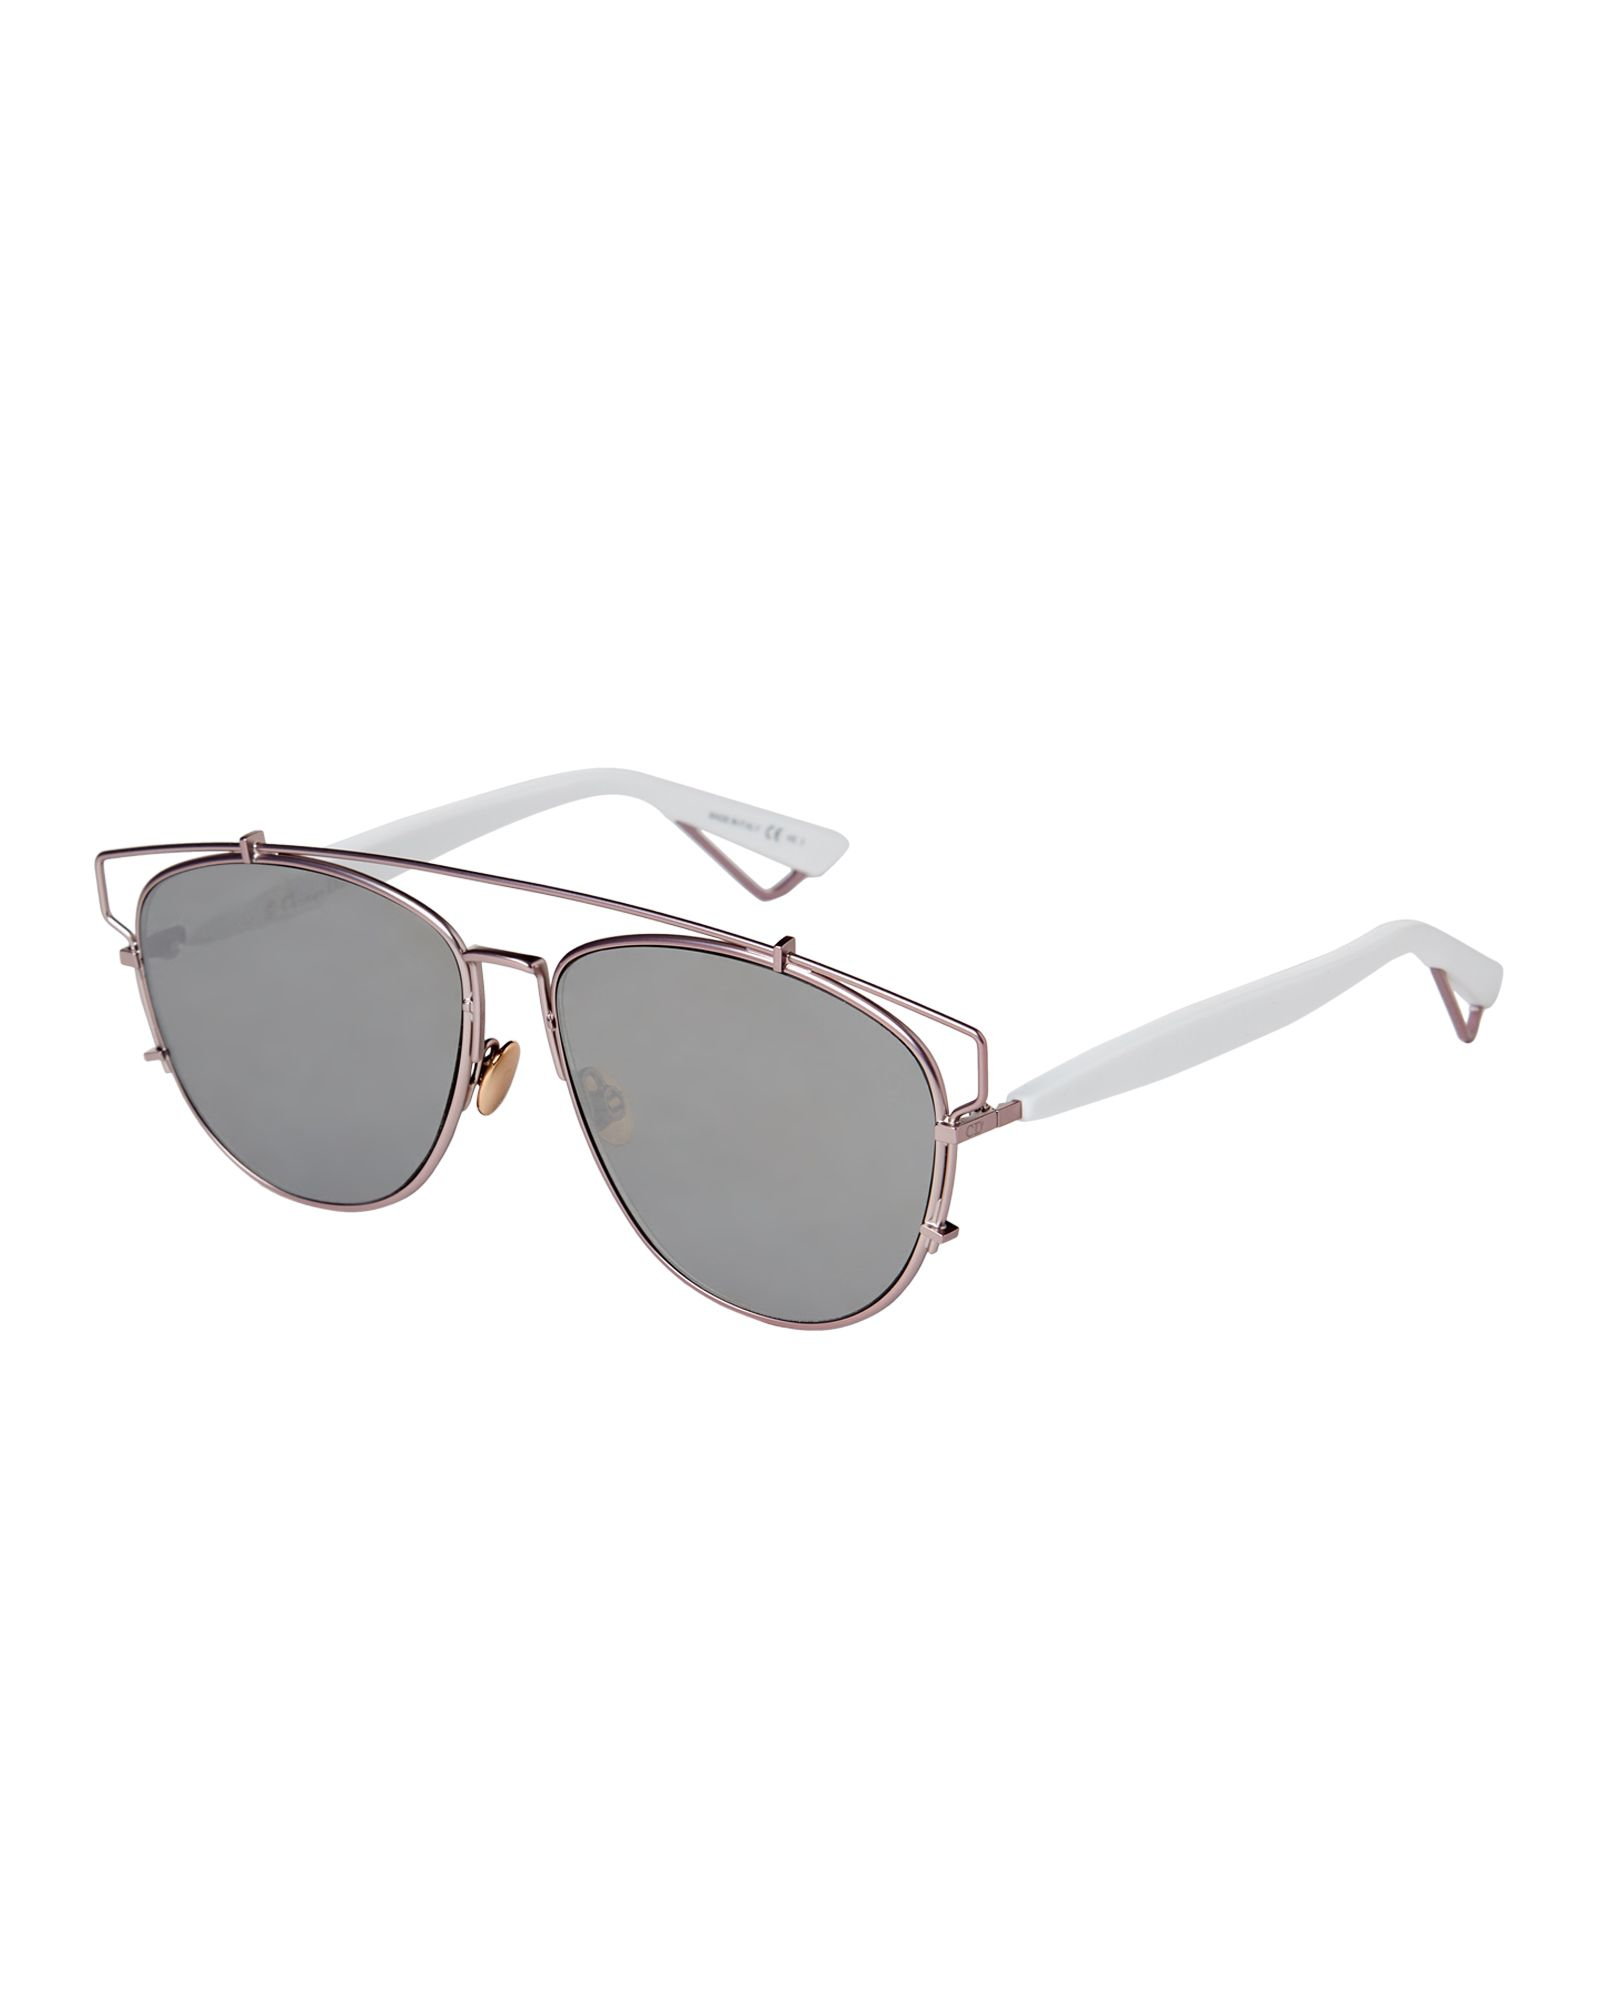 8d2c268785c4f Christian Dior Technologic TVGOT Rose Gold-Tone Aviator Sunglasses ...